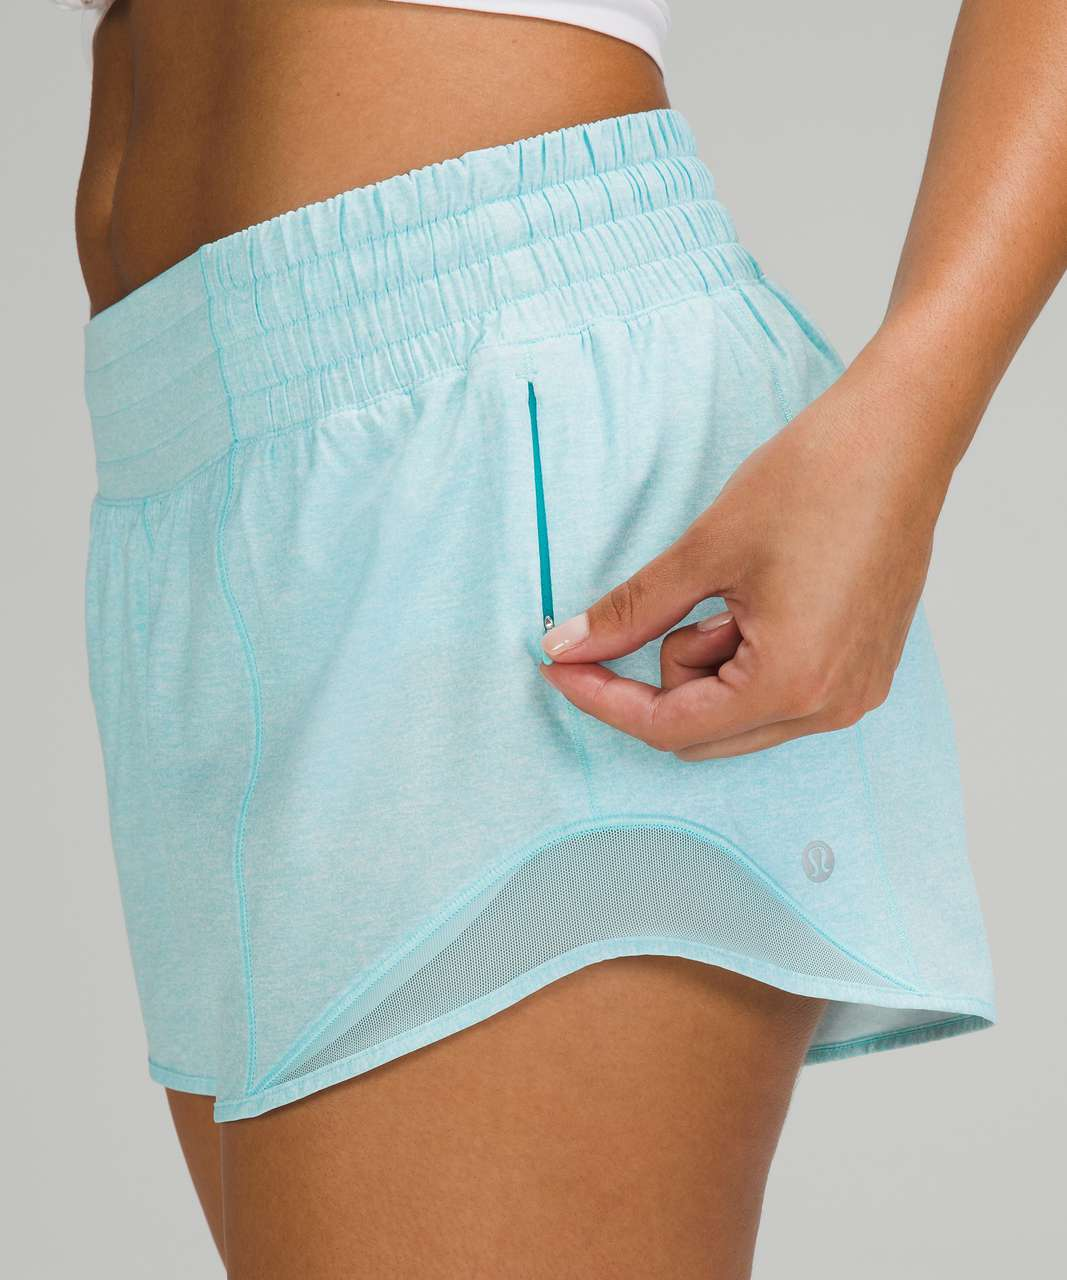 "Lululemon Hotty Hot High-Rise Short 2.5"" - Heather Lux Multi Icing Blue / Icing Blue"